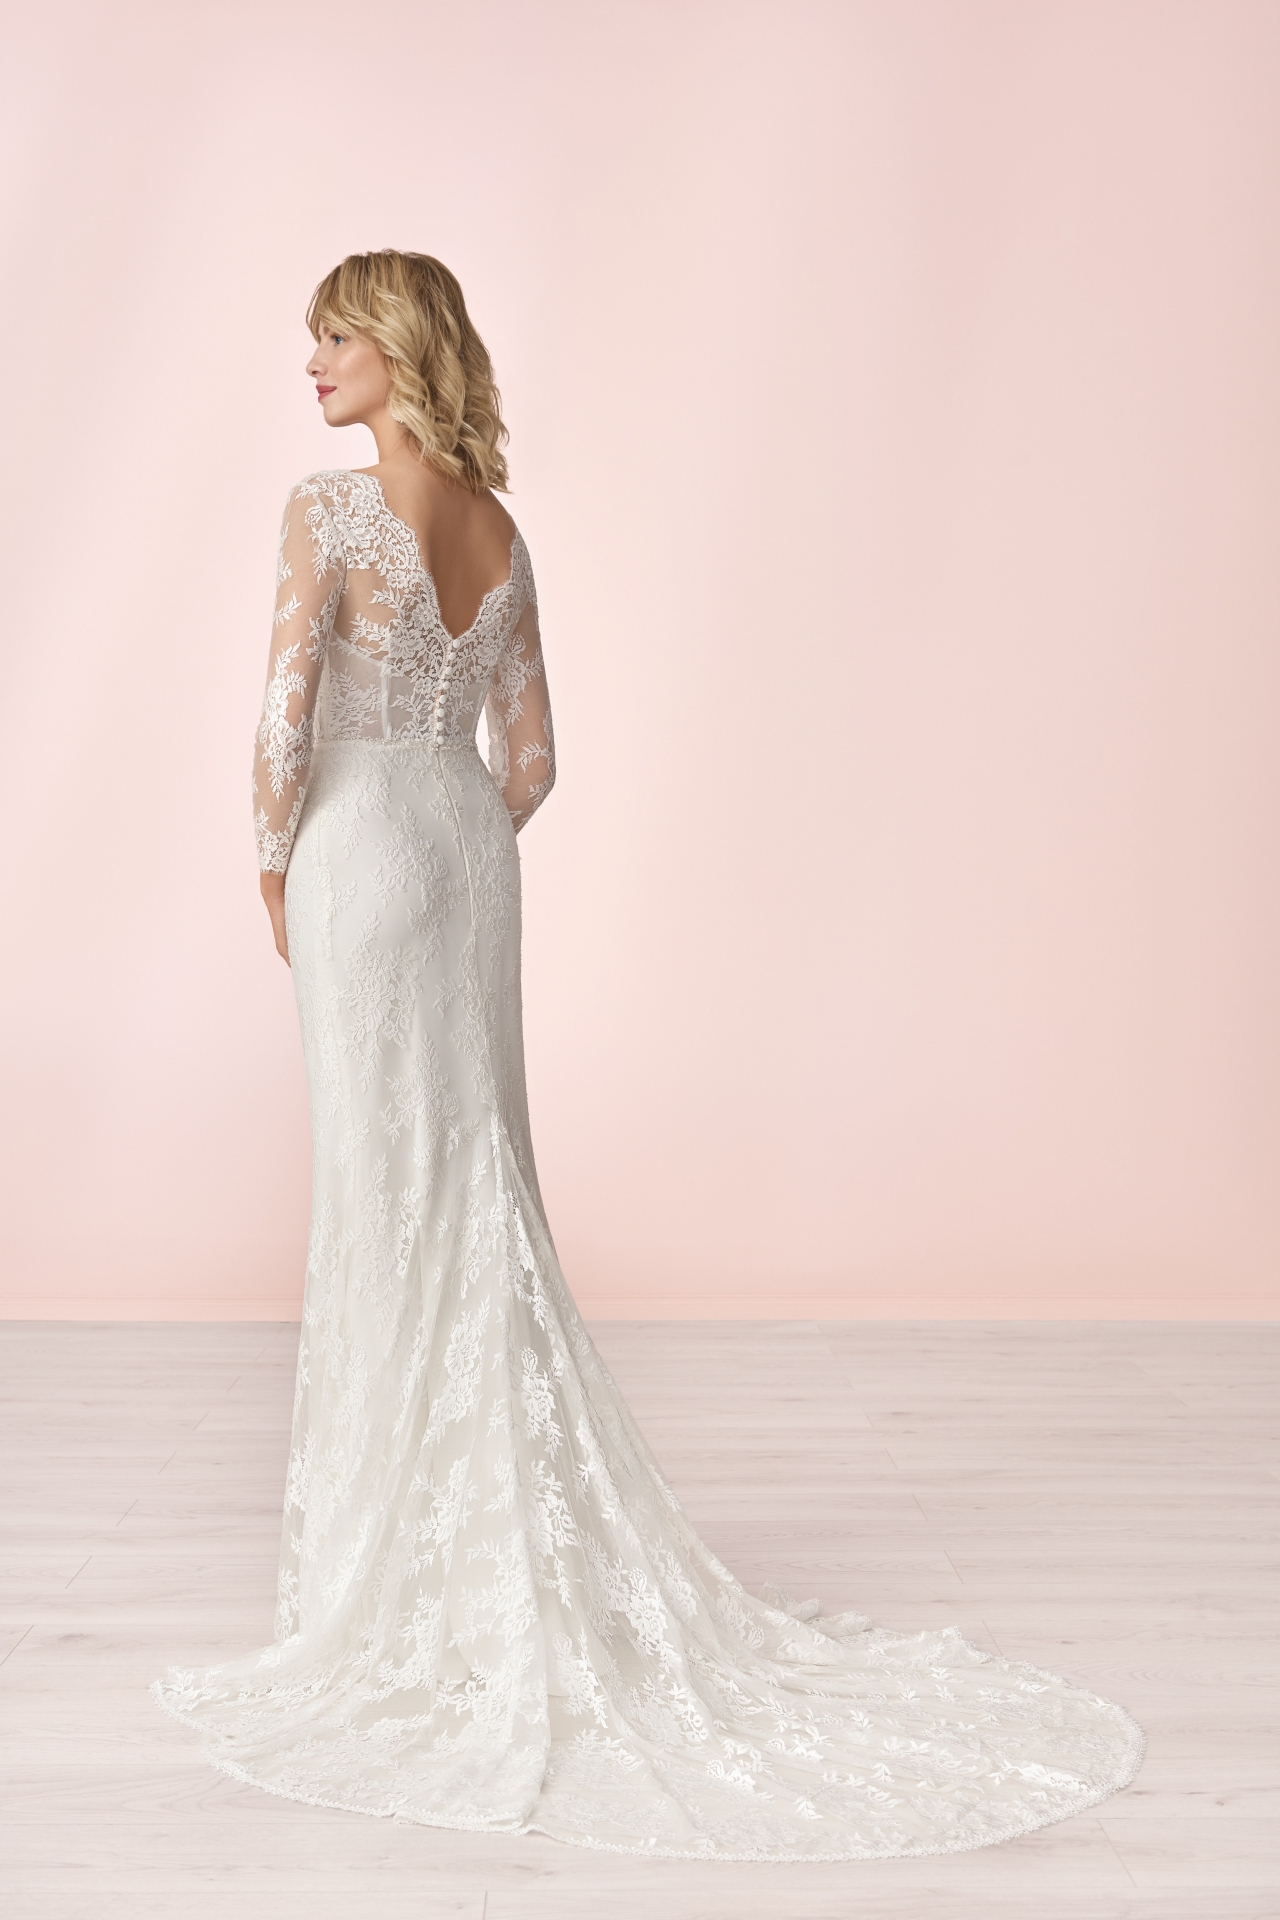 Brautkleid Elizabeth Konin 2019 - 4093T-2